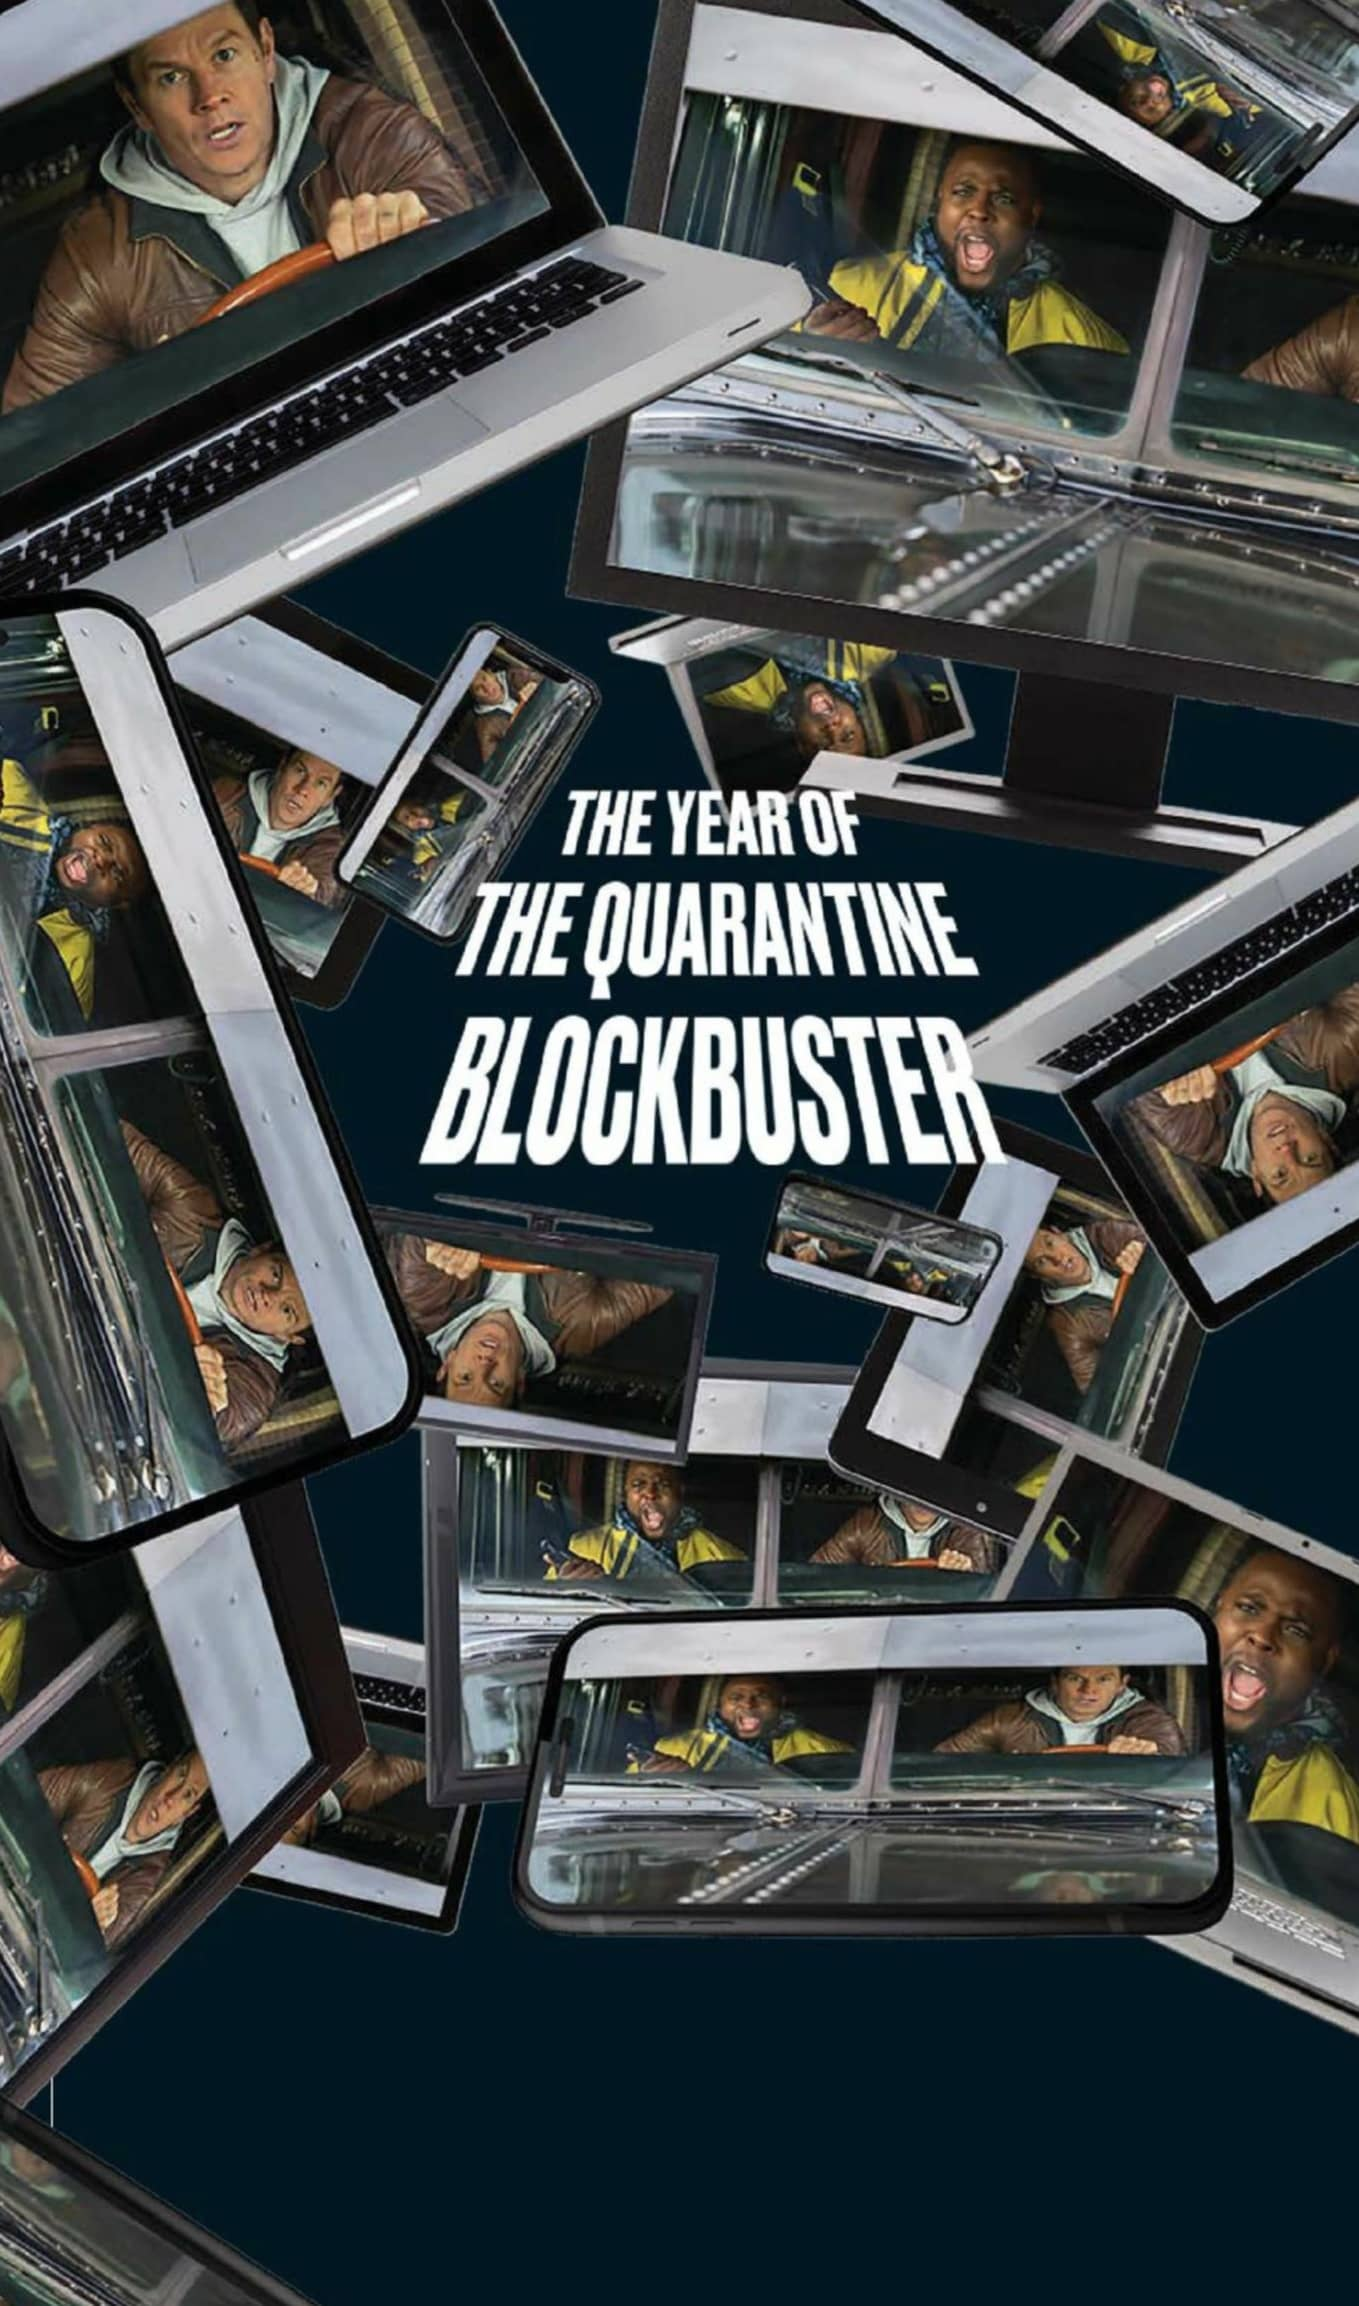 The Year of The Quarantine Blockbuster